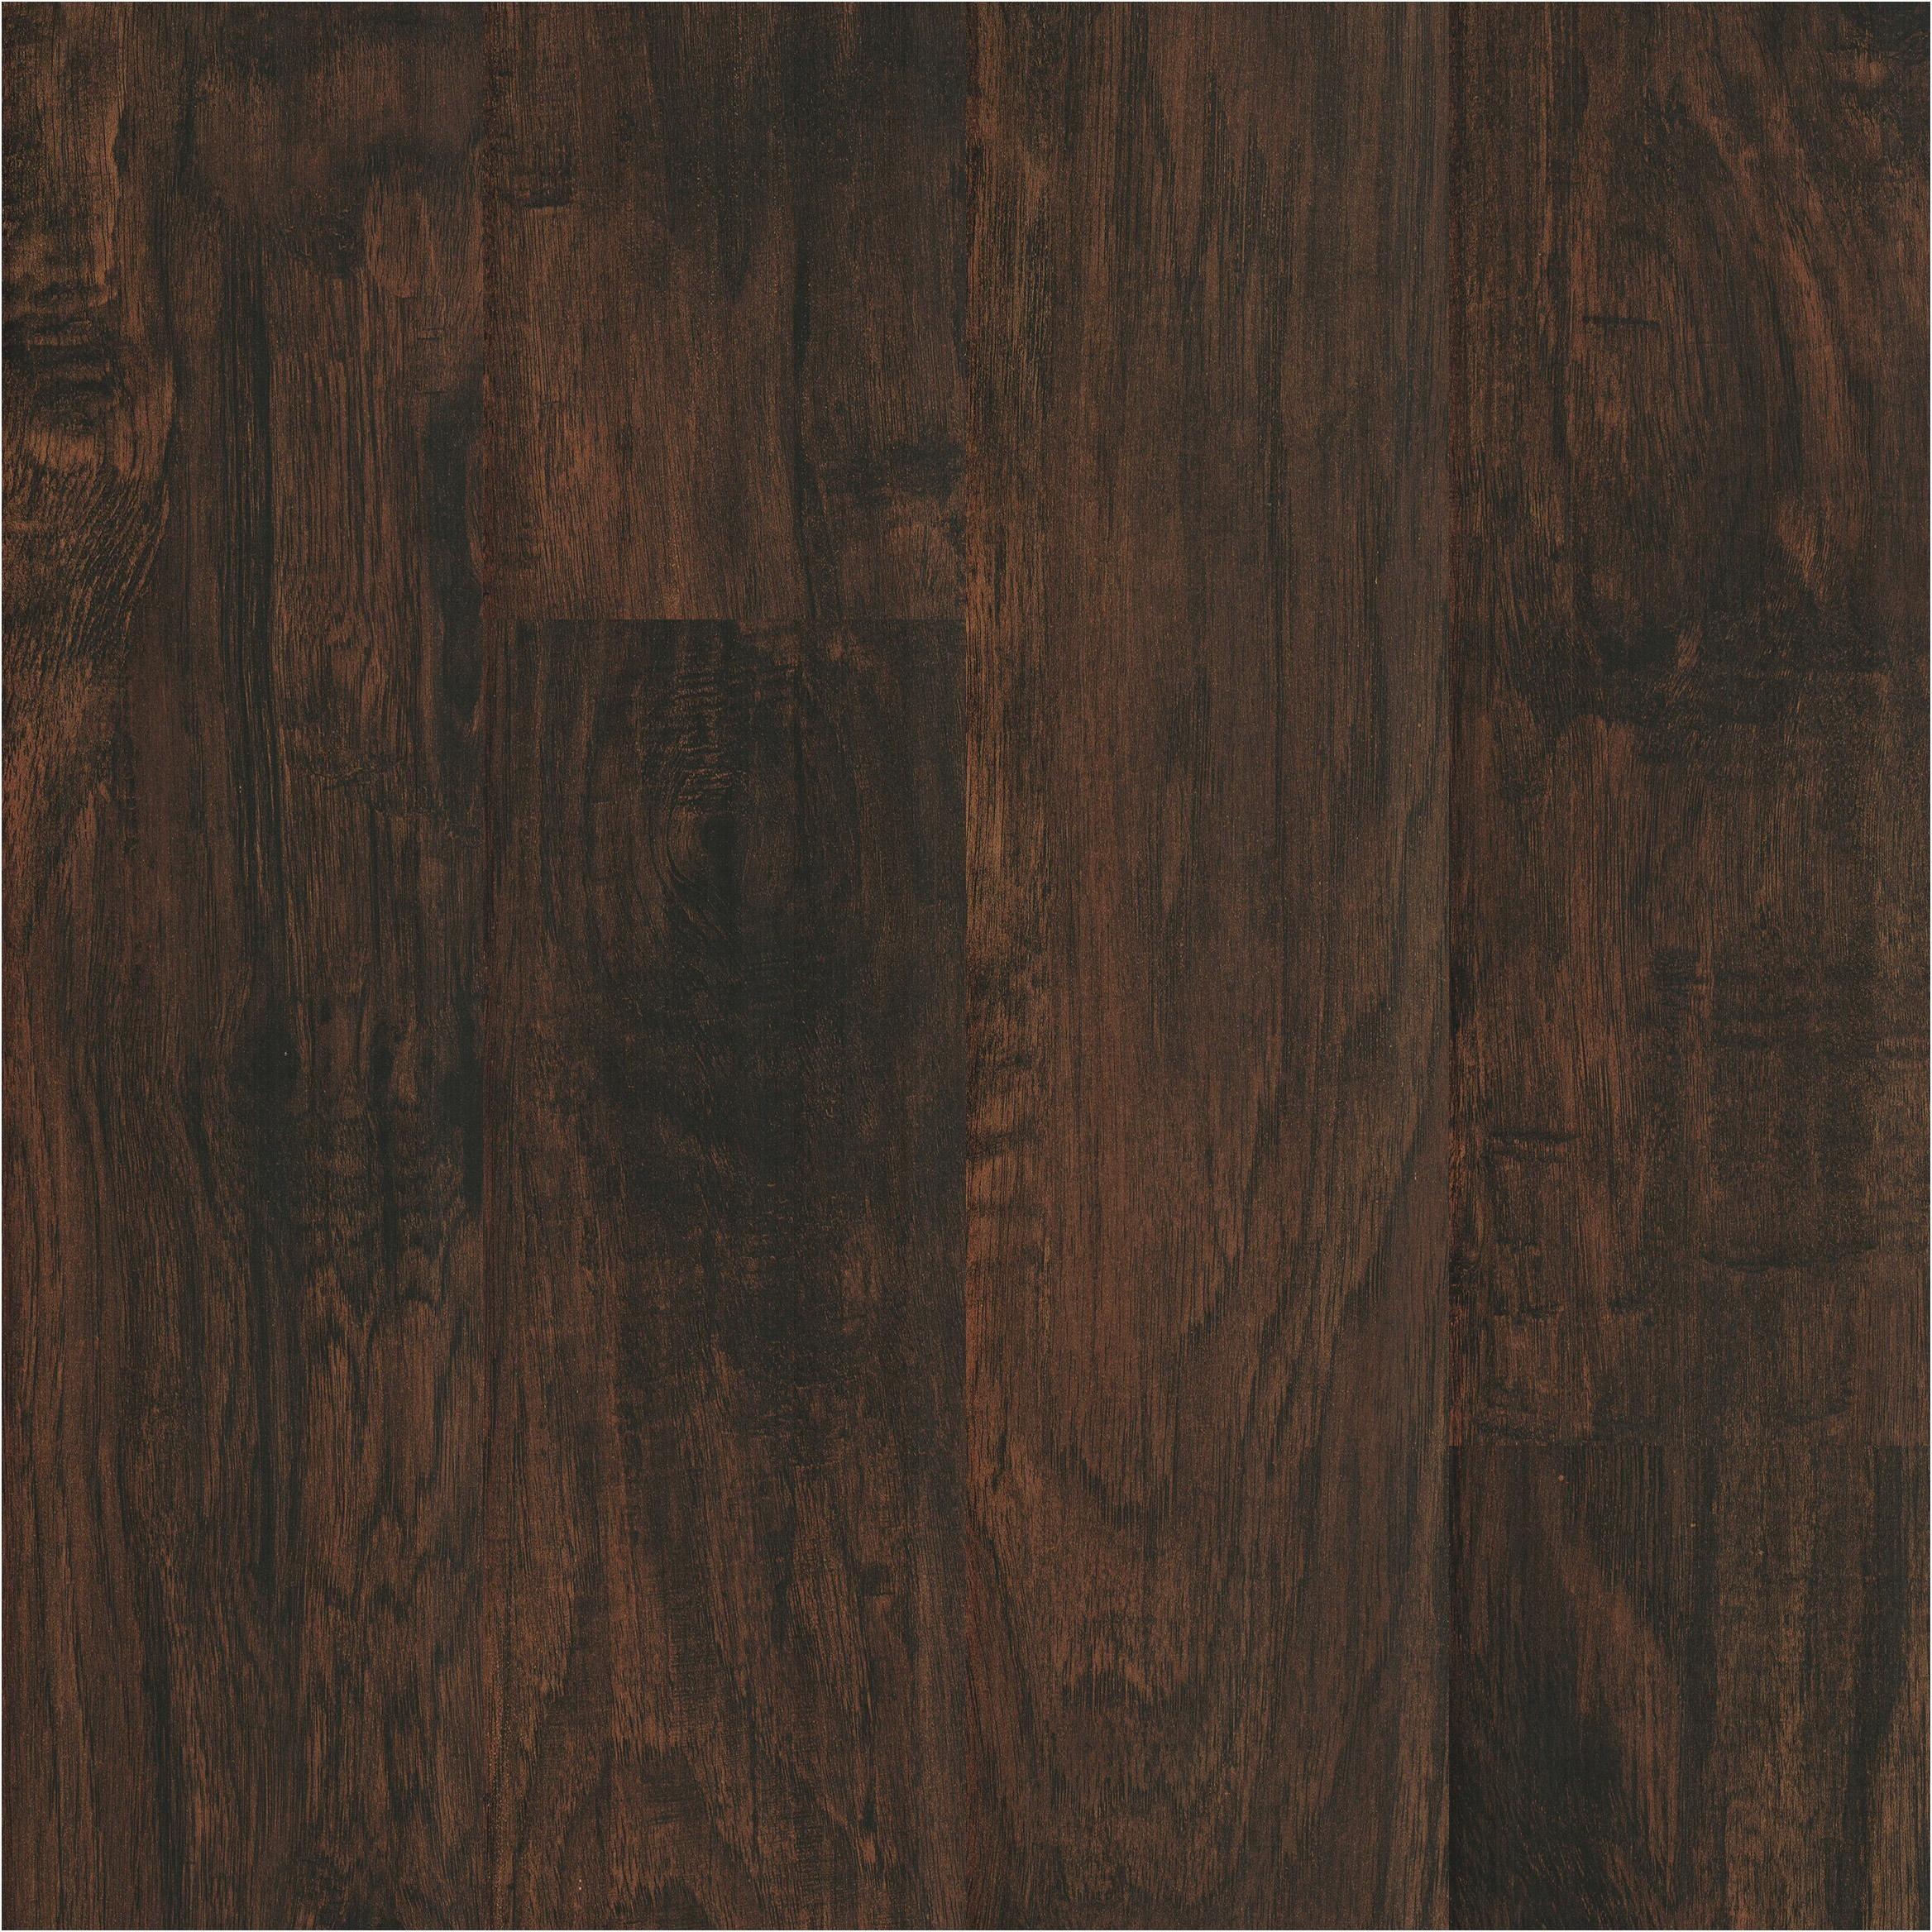 cleaning luxury vinyl plank flooring stock ivc deep java hickory 6 quot wide waterproof to her